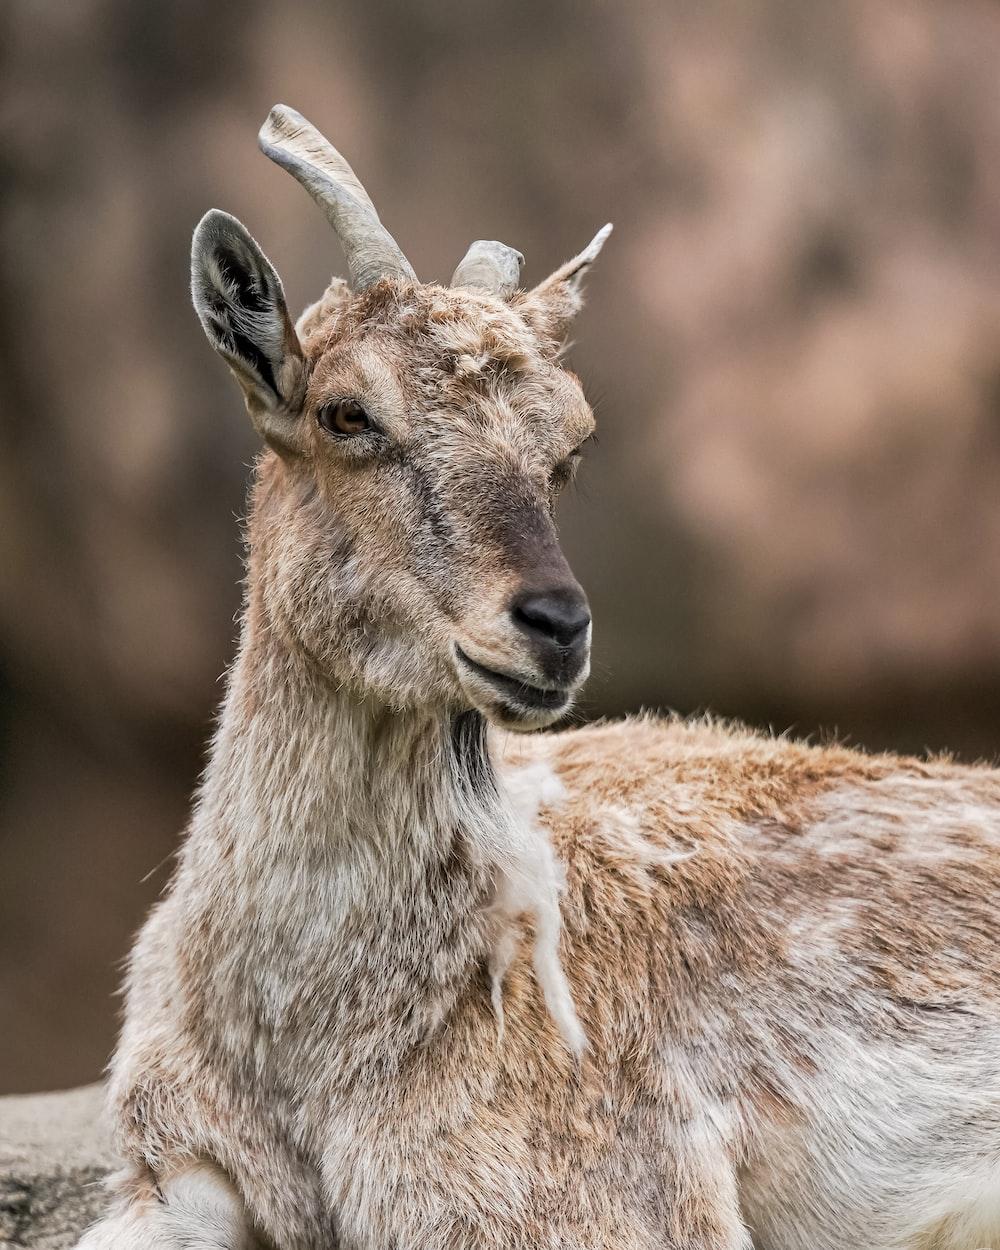 close-up photo of brown deer